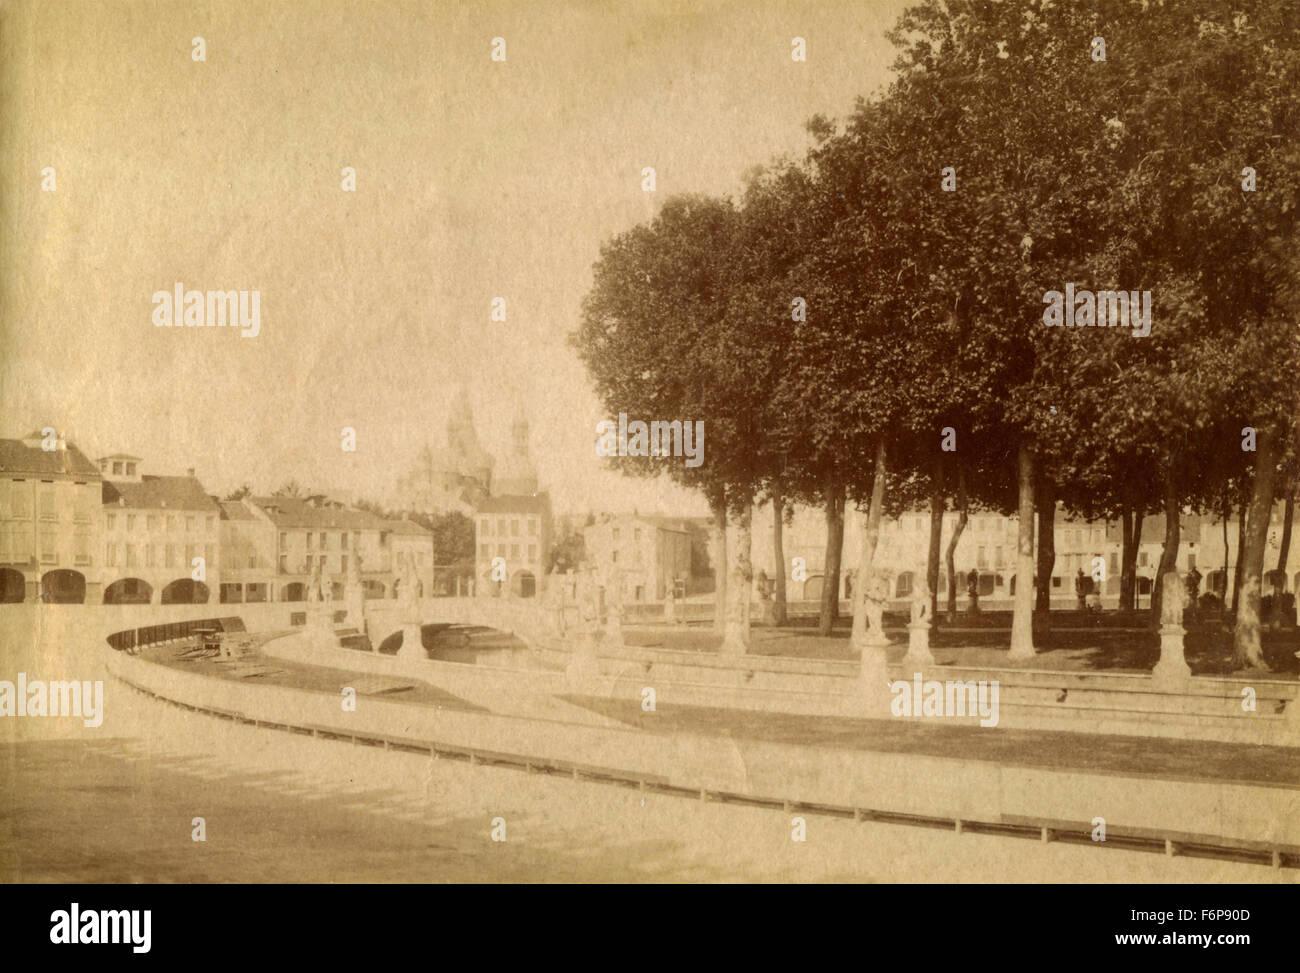 Piazza Vittorio Emanuele, Padua, Italy - Stock Image